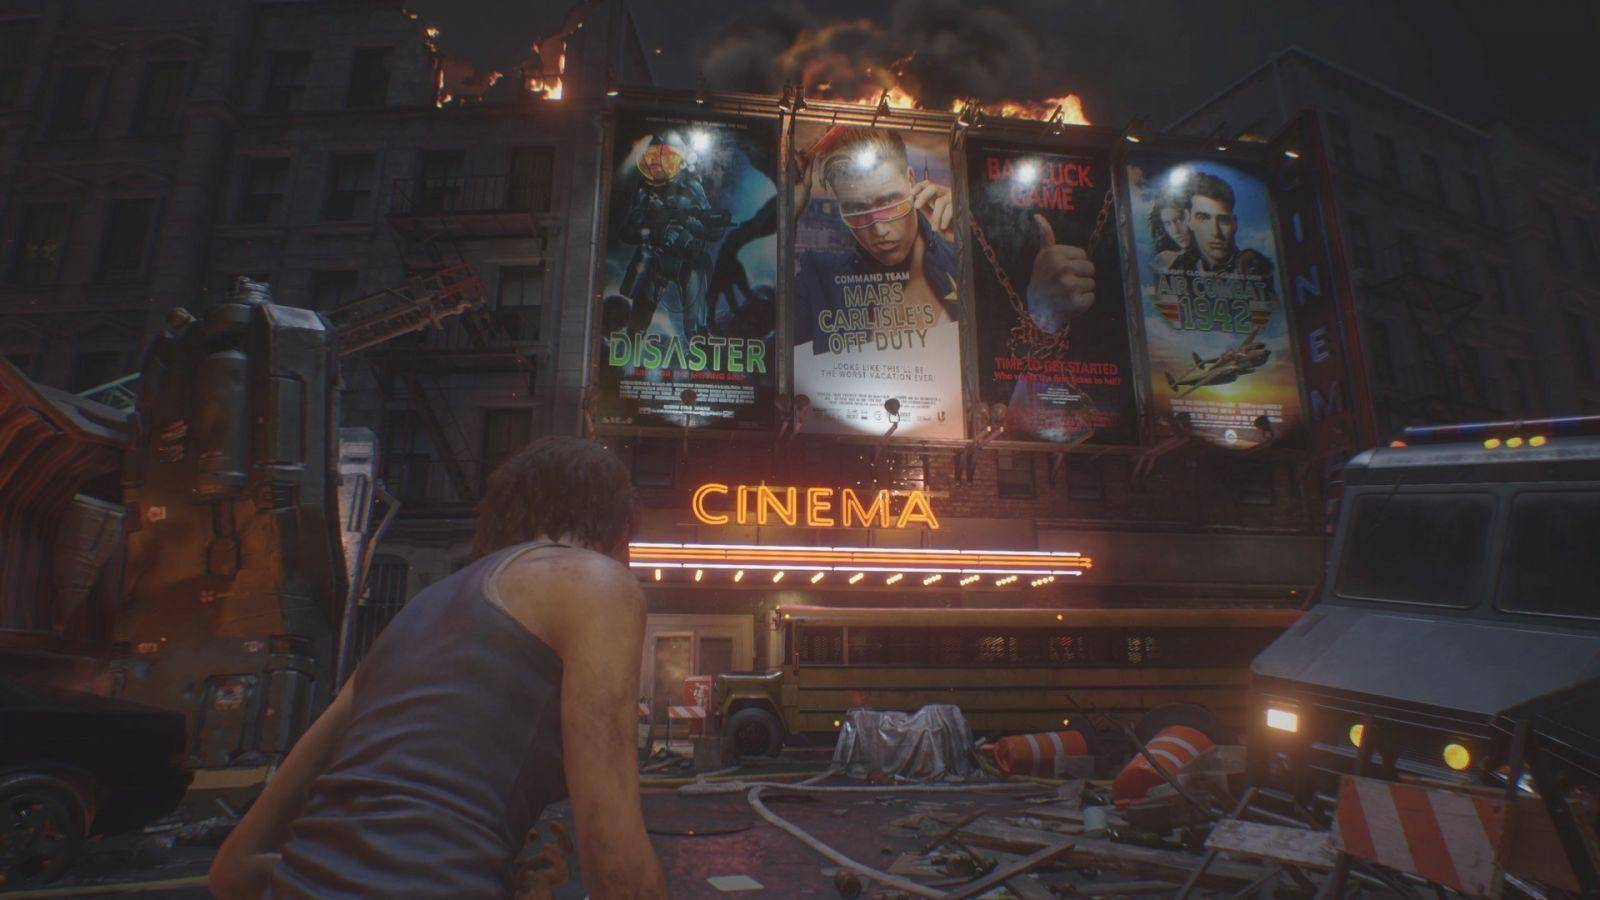 resident evil 3 cine posters